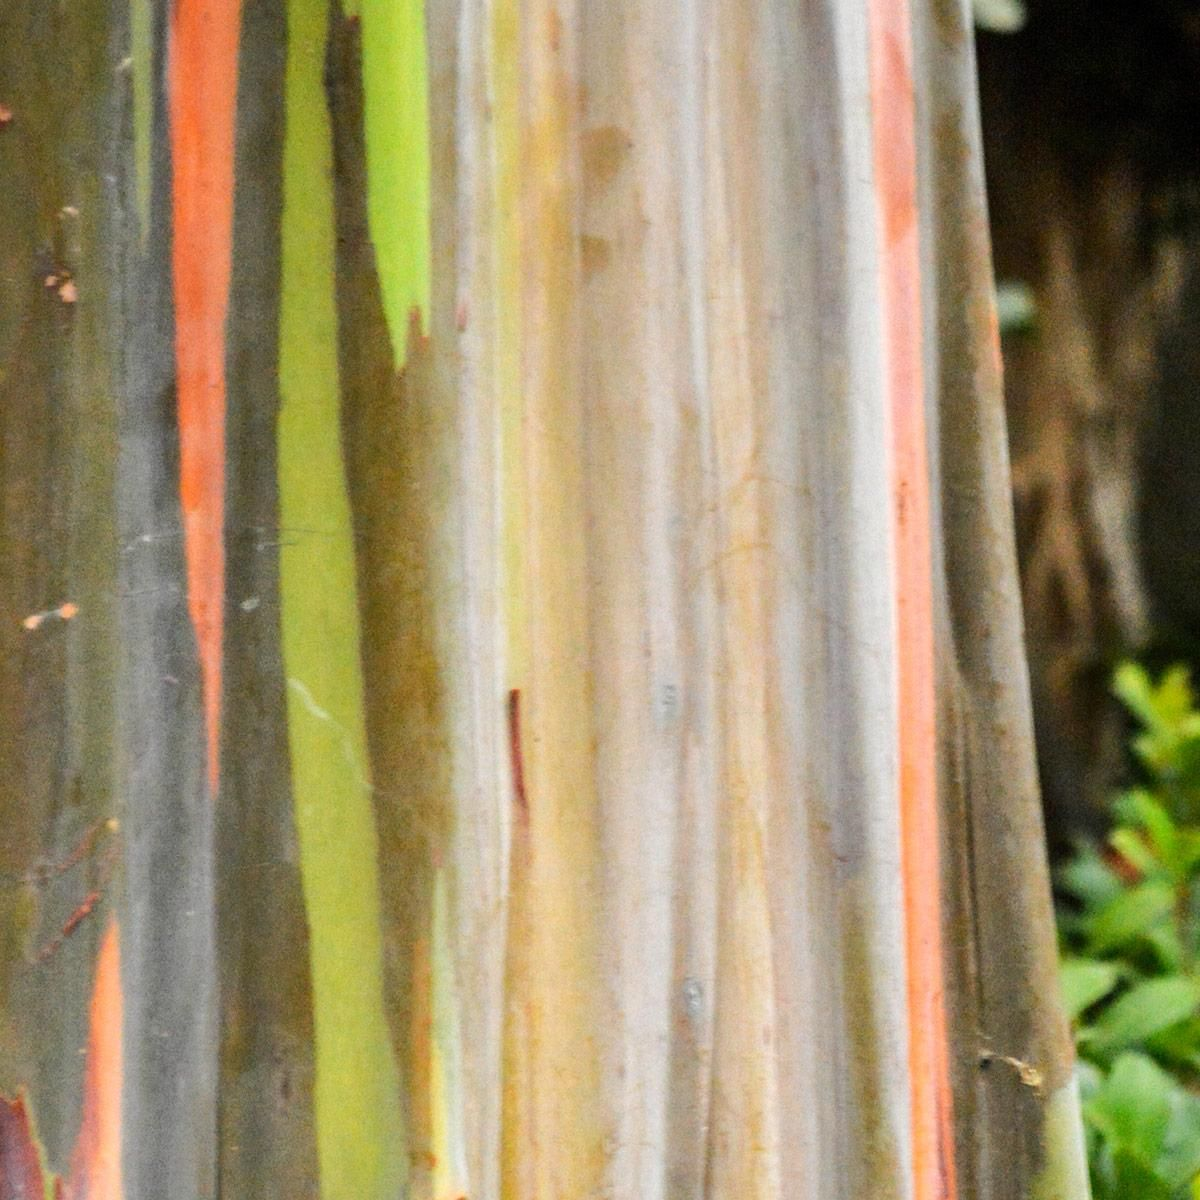 Muda de Eucalipto-arco-íris - Eucalyptus deglupta